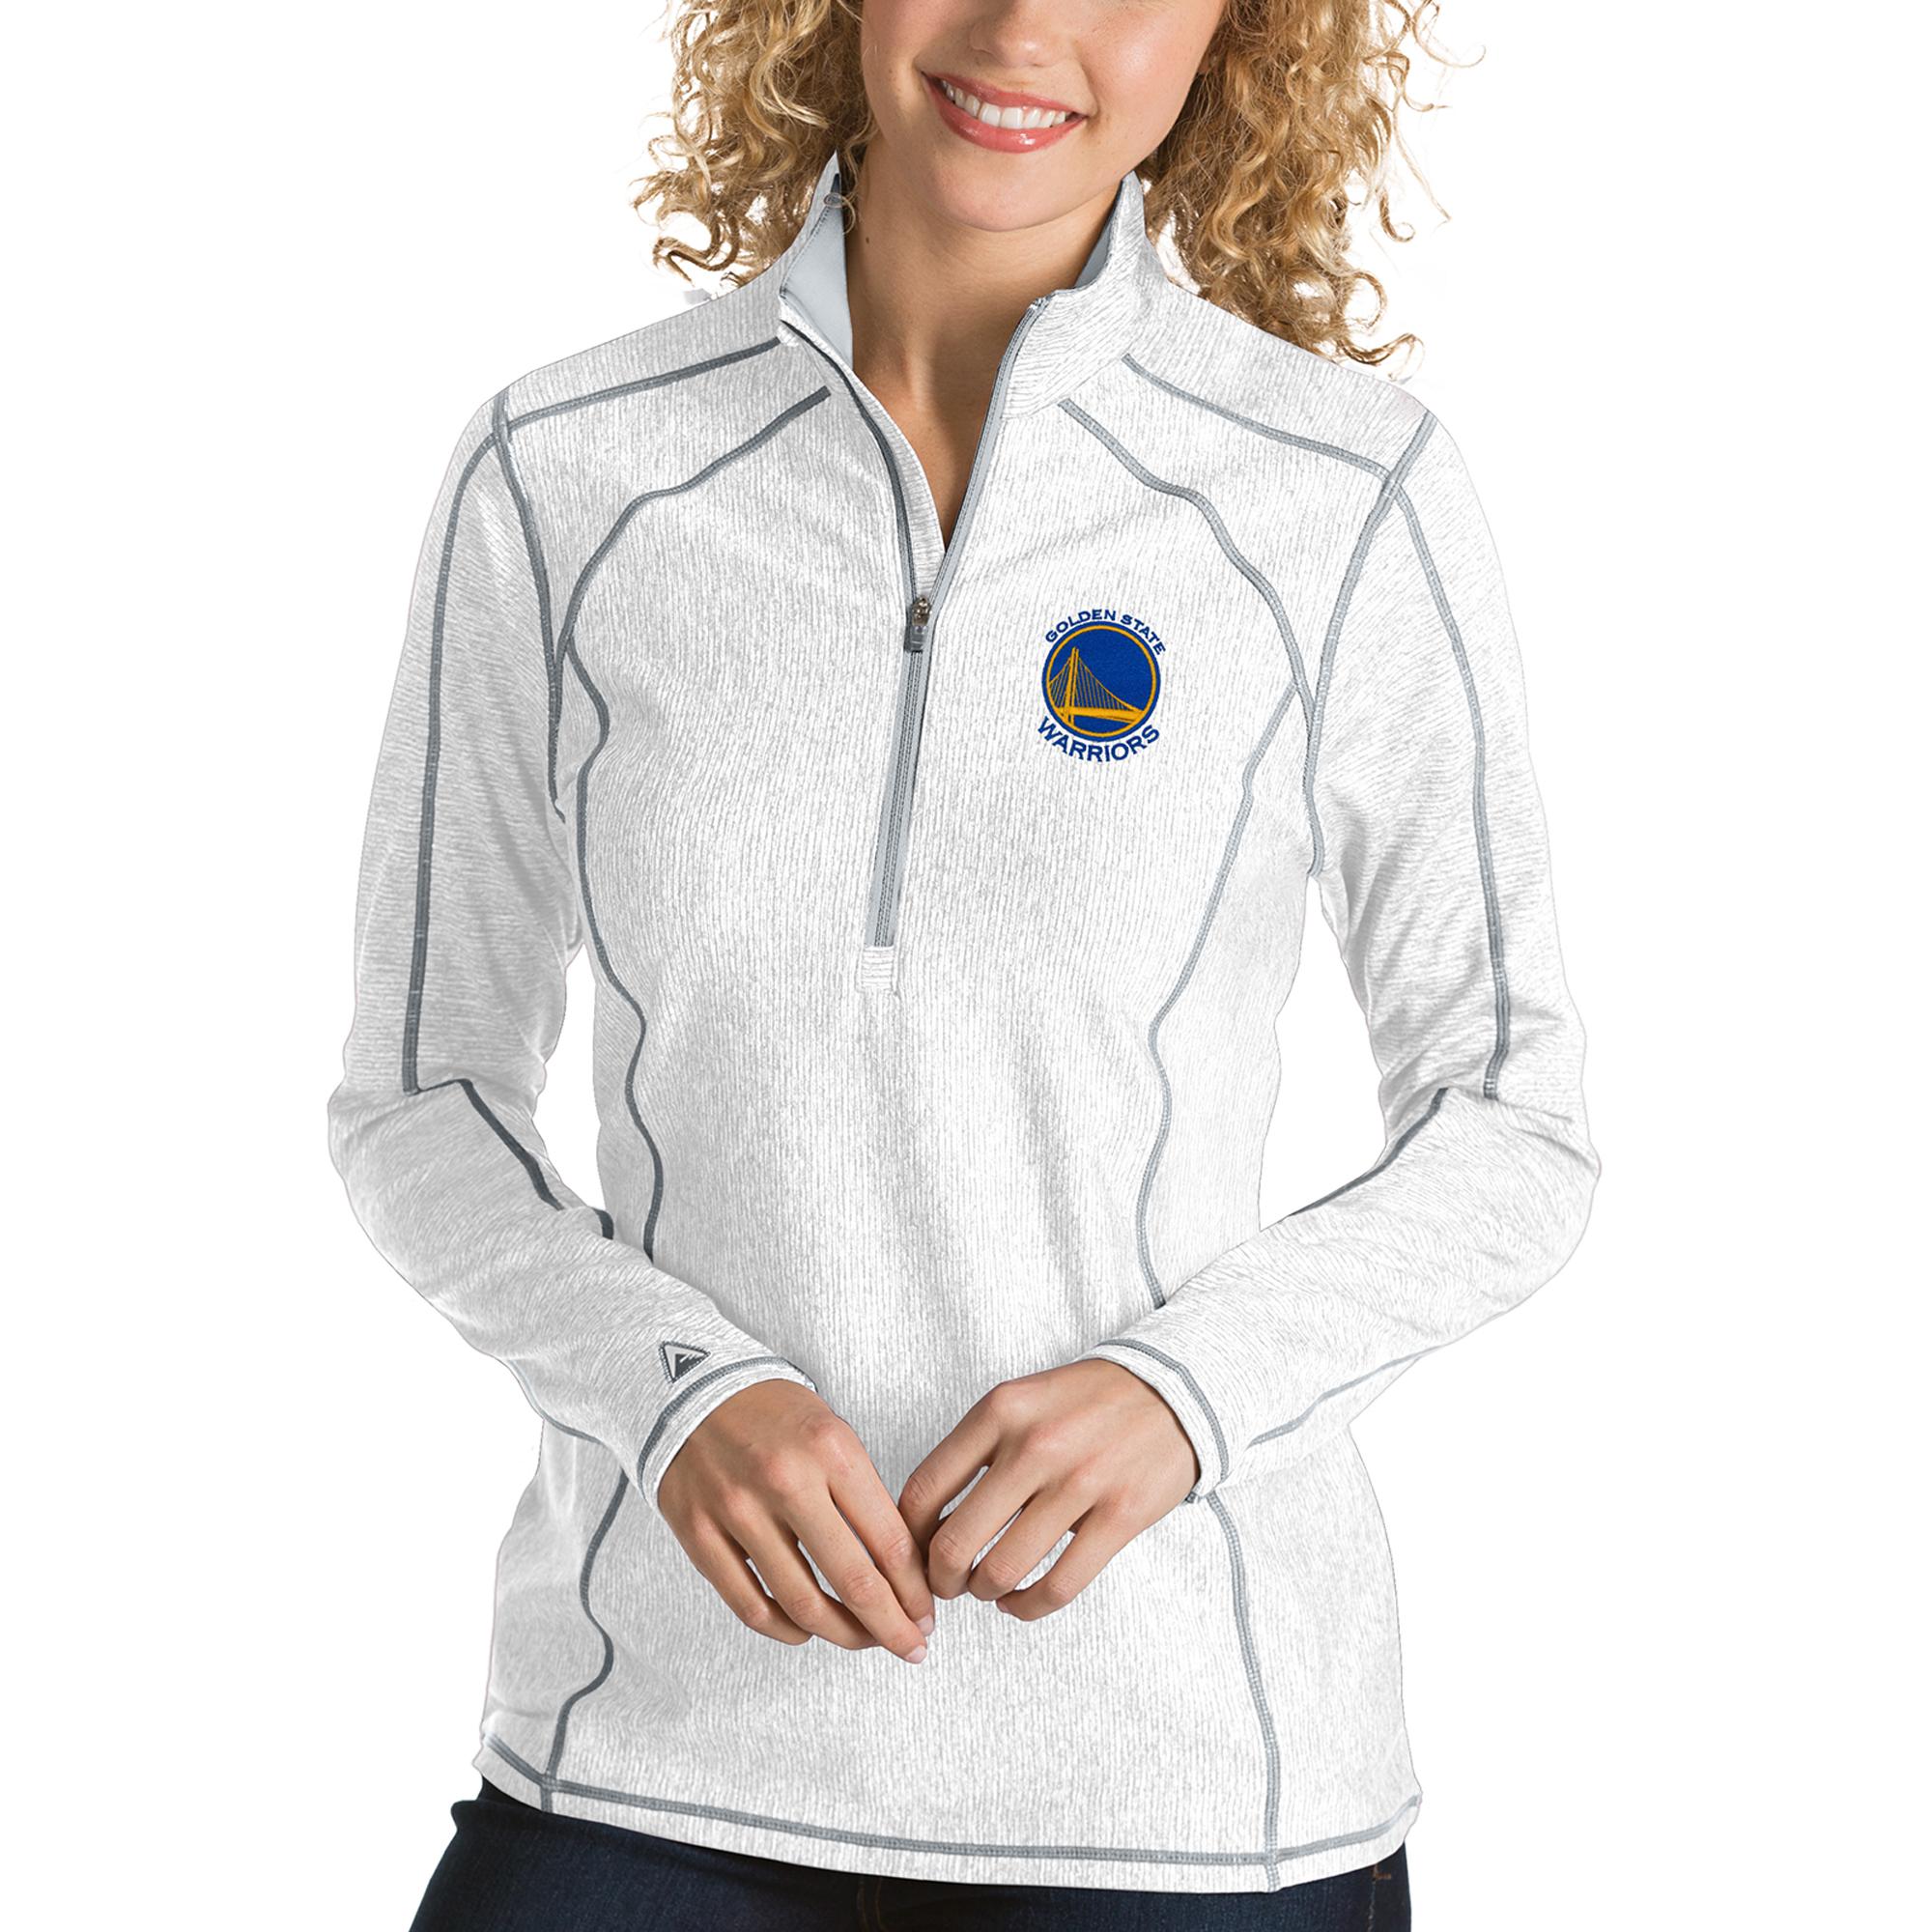 Golden State Warriors Antigua Women's Tempo Half-Zip Pullover Jacket - White